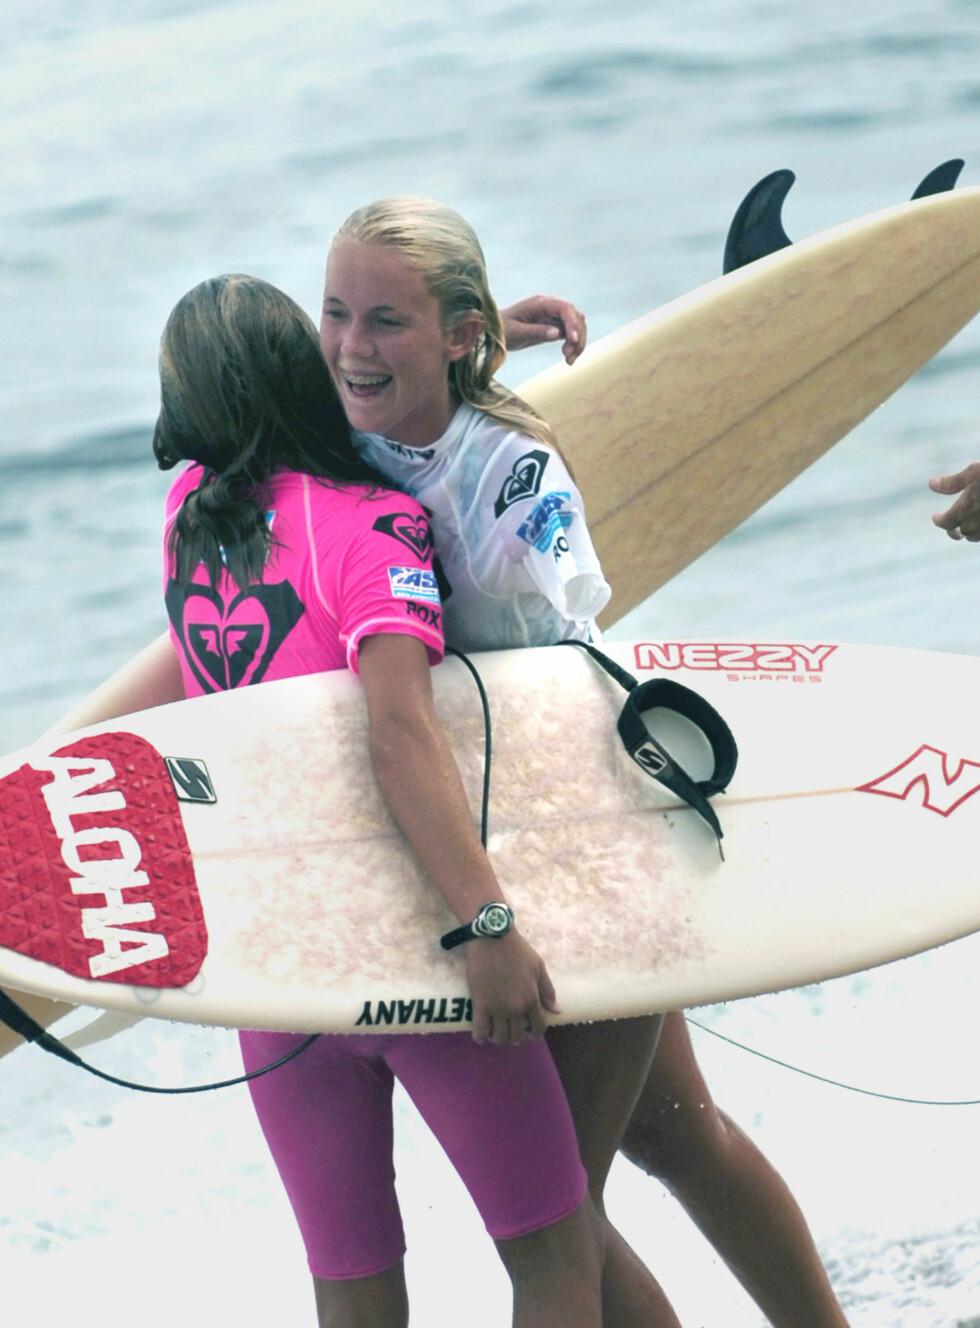 I MILJØET: Bethany Hamilton og surfervenninnen Carissa Moore ga hverandre en god klem etter en konkurranse på Hawaii to år etter ulykken. Foto: NTB Scanpix